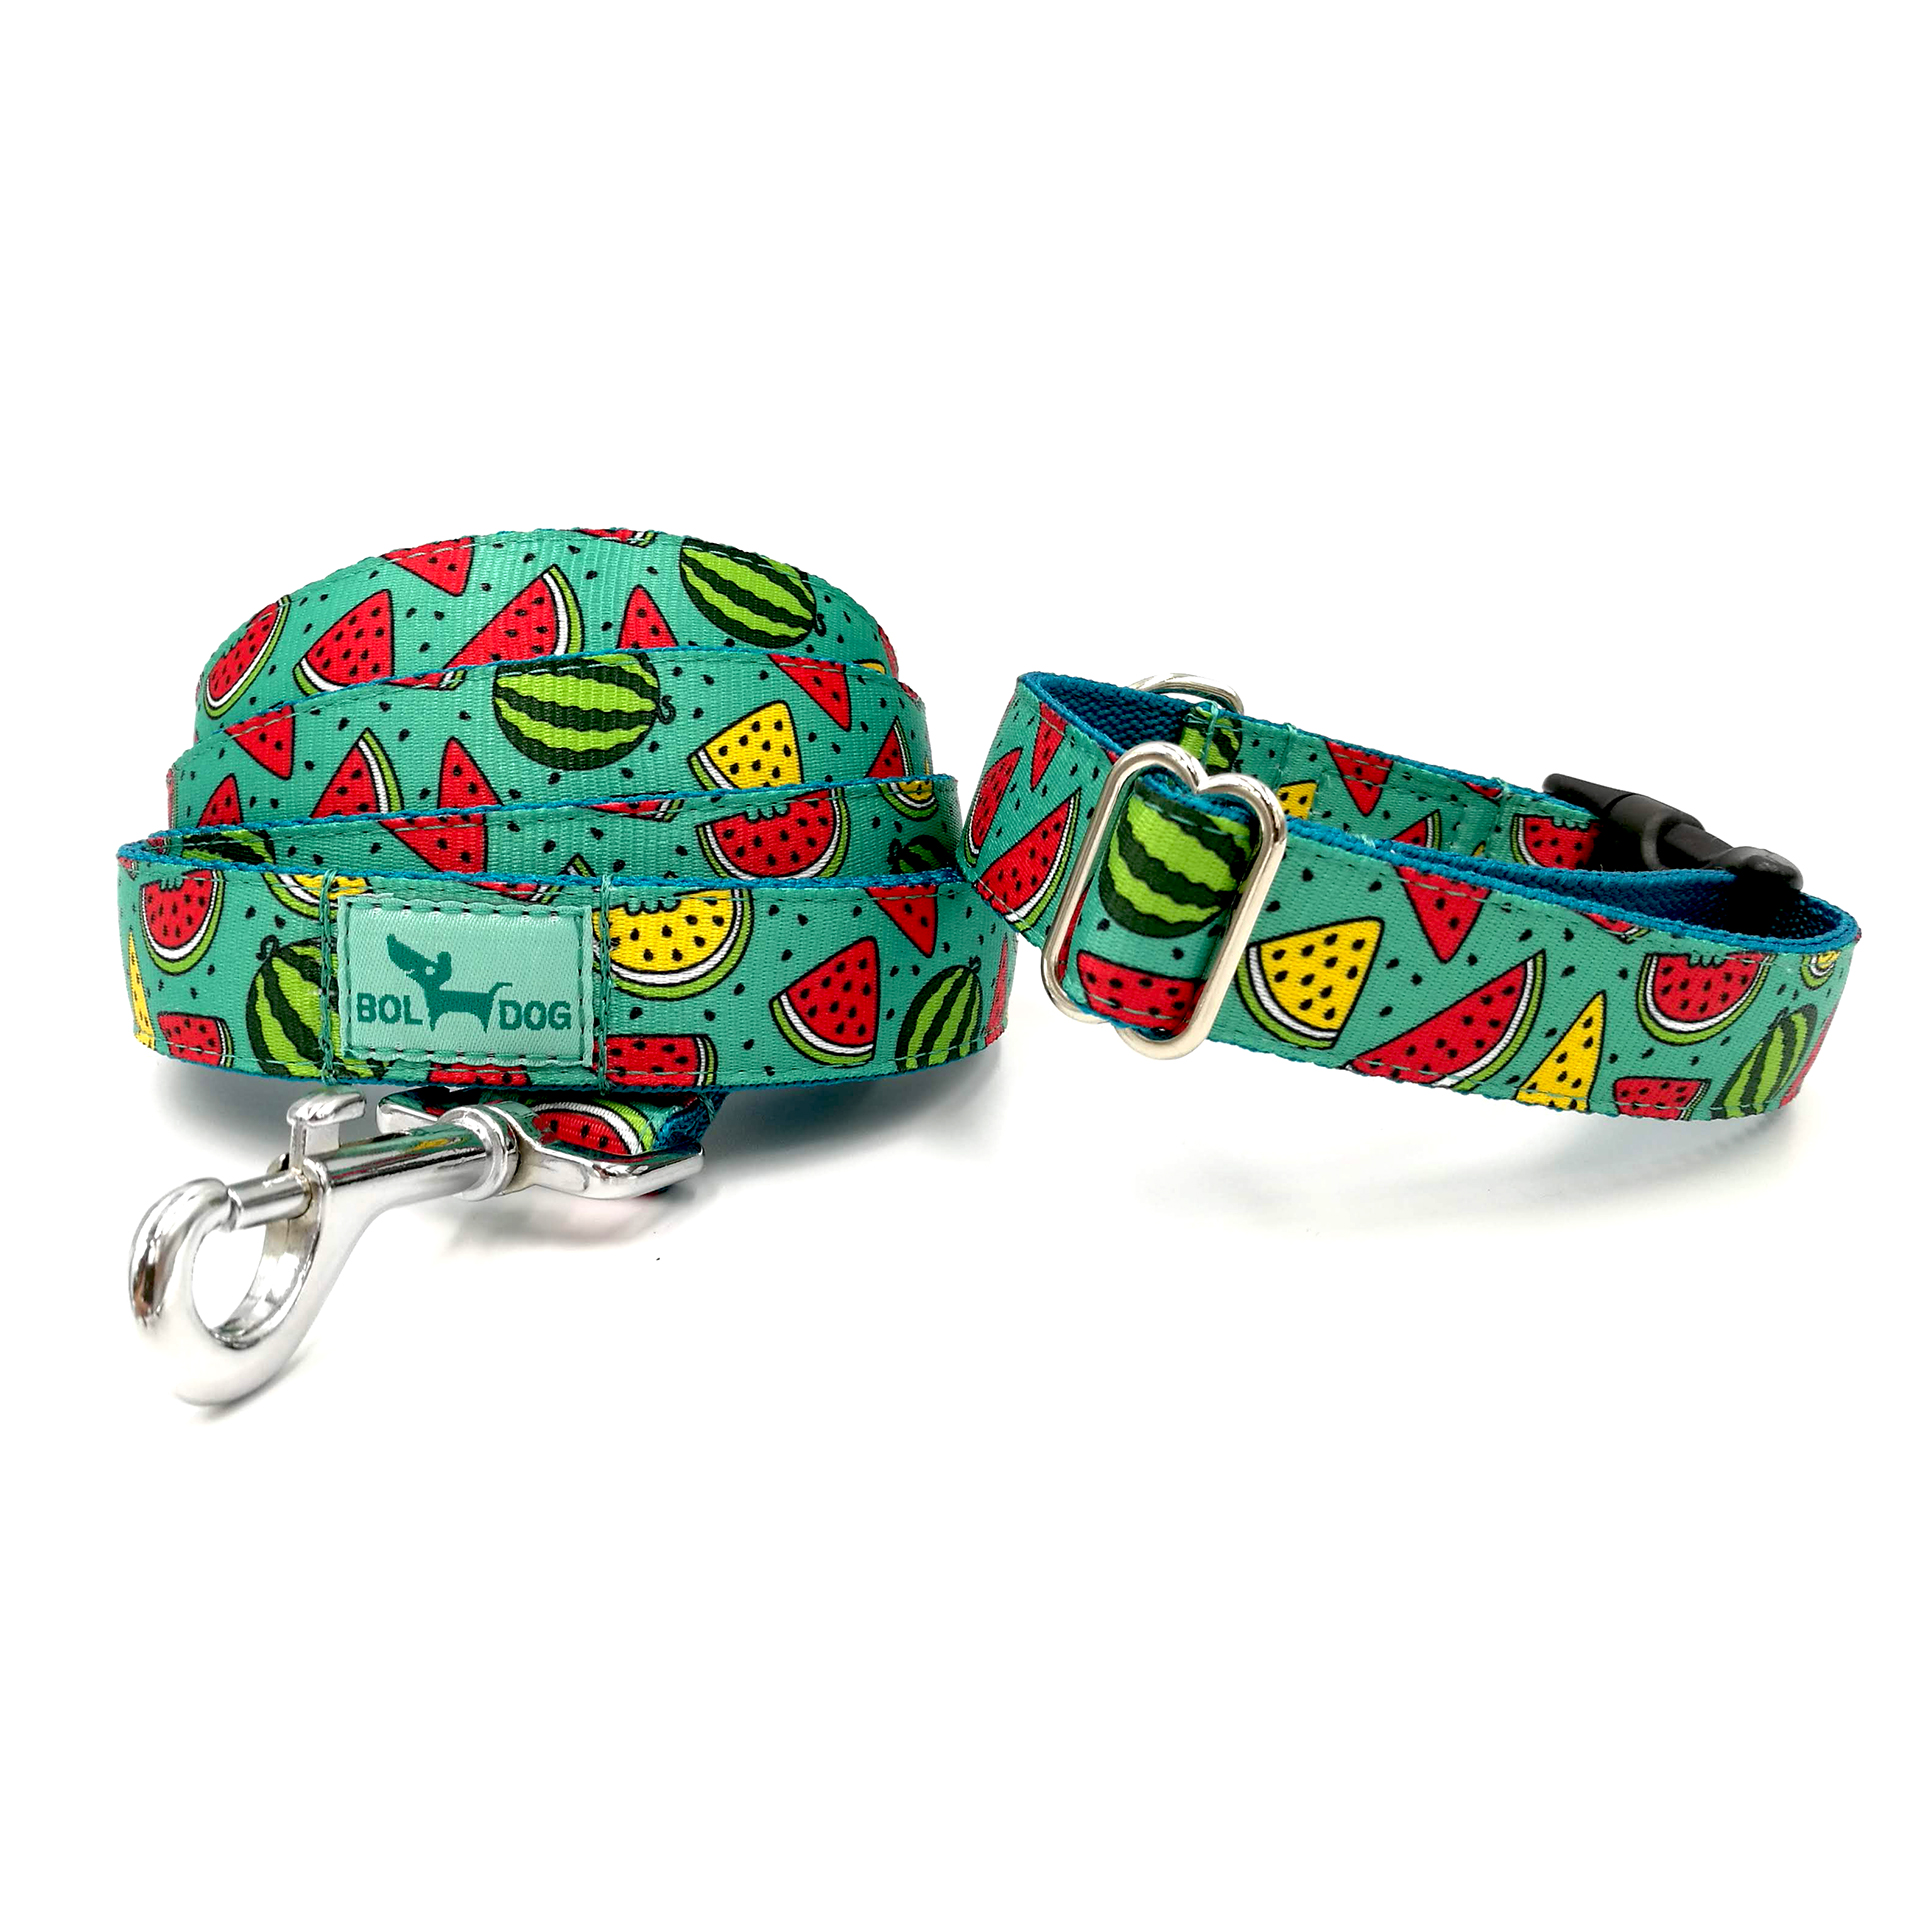 Melon patterned dog leash